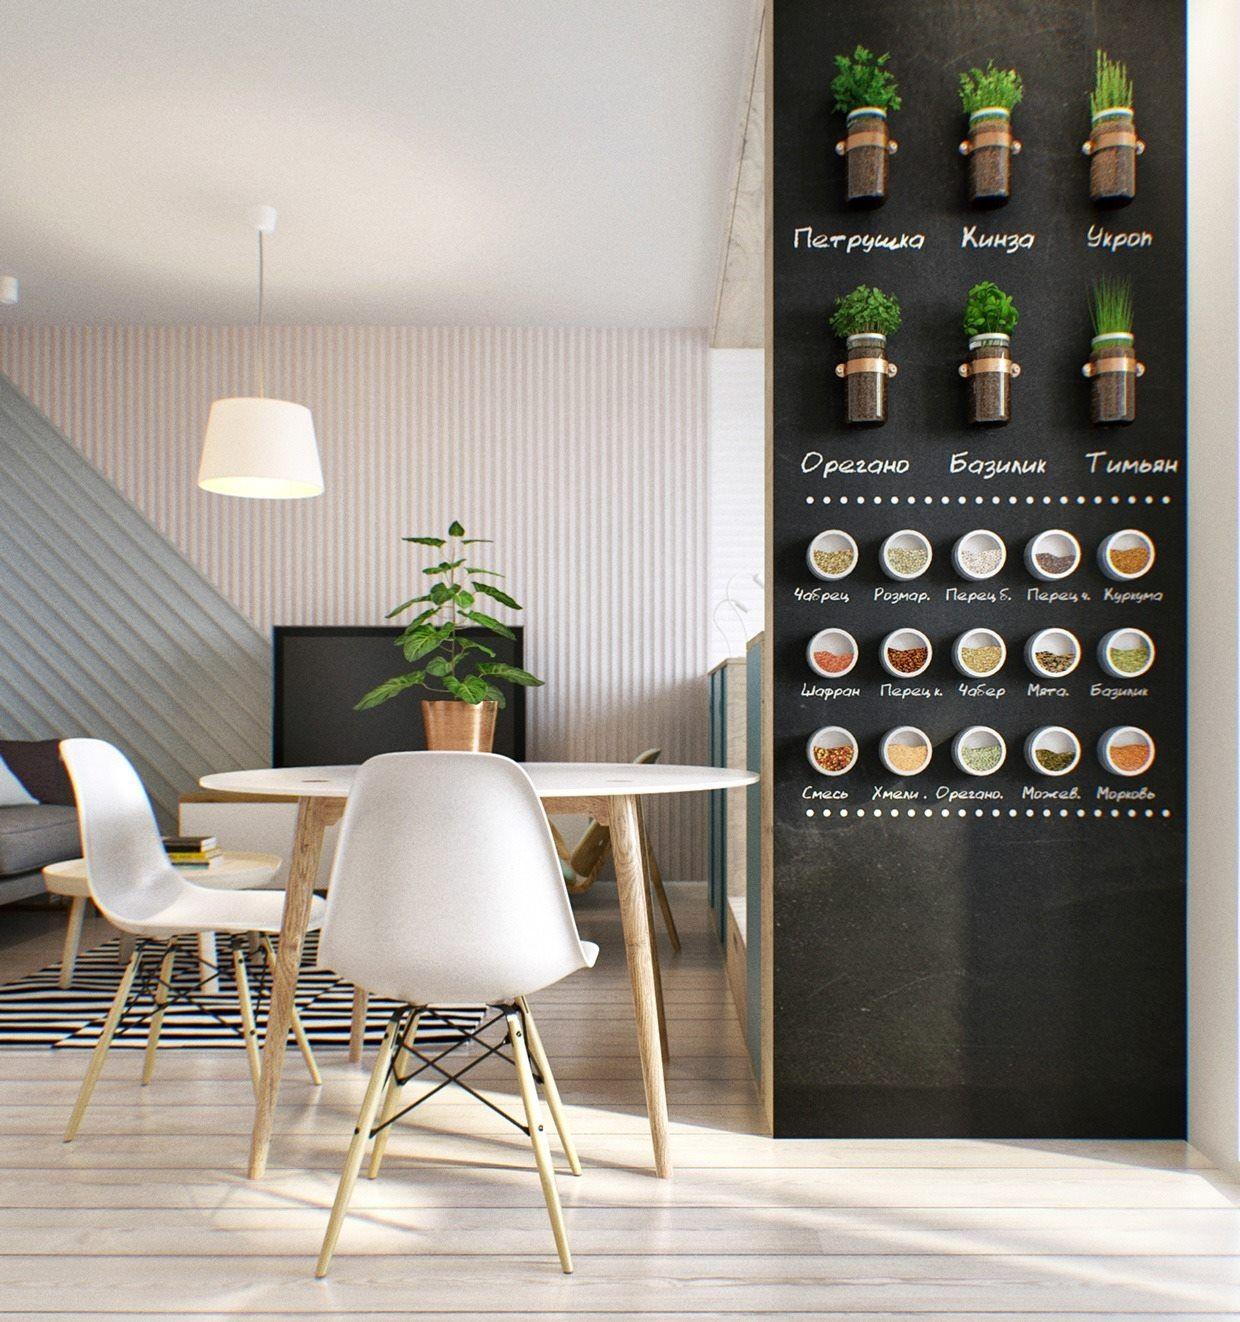 parete lavagna cucina | Pavimenti cucina | Pinterest | Decor ...